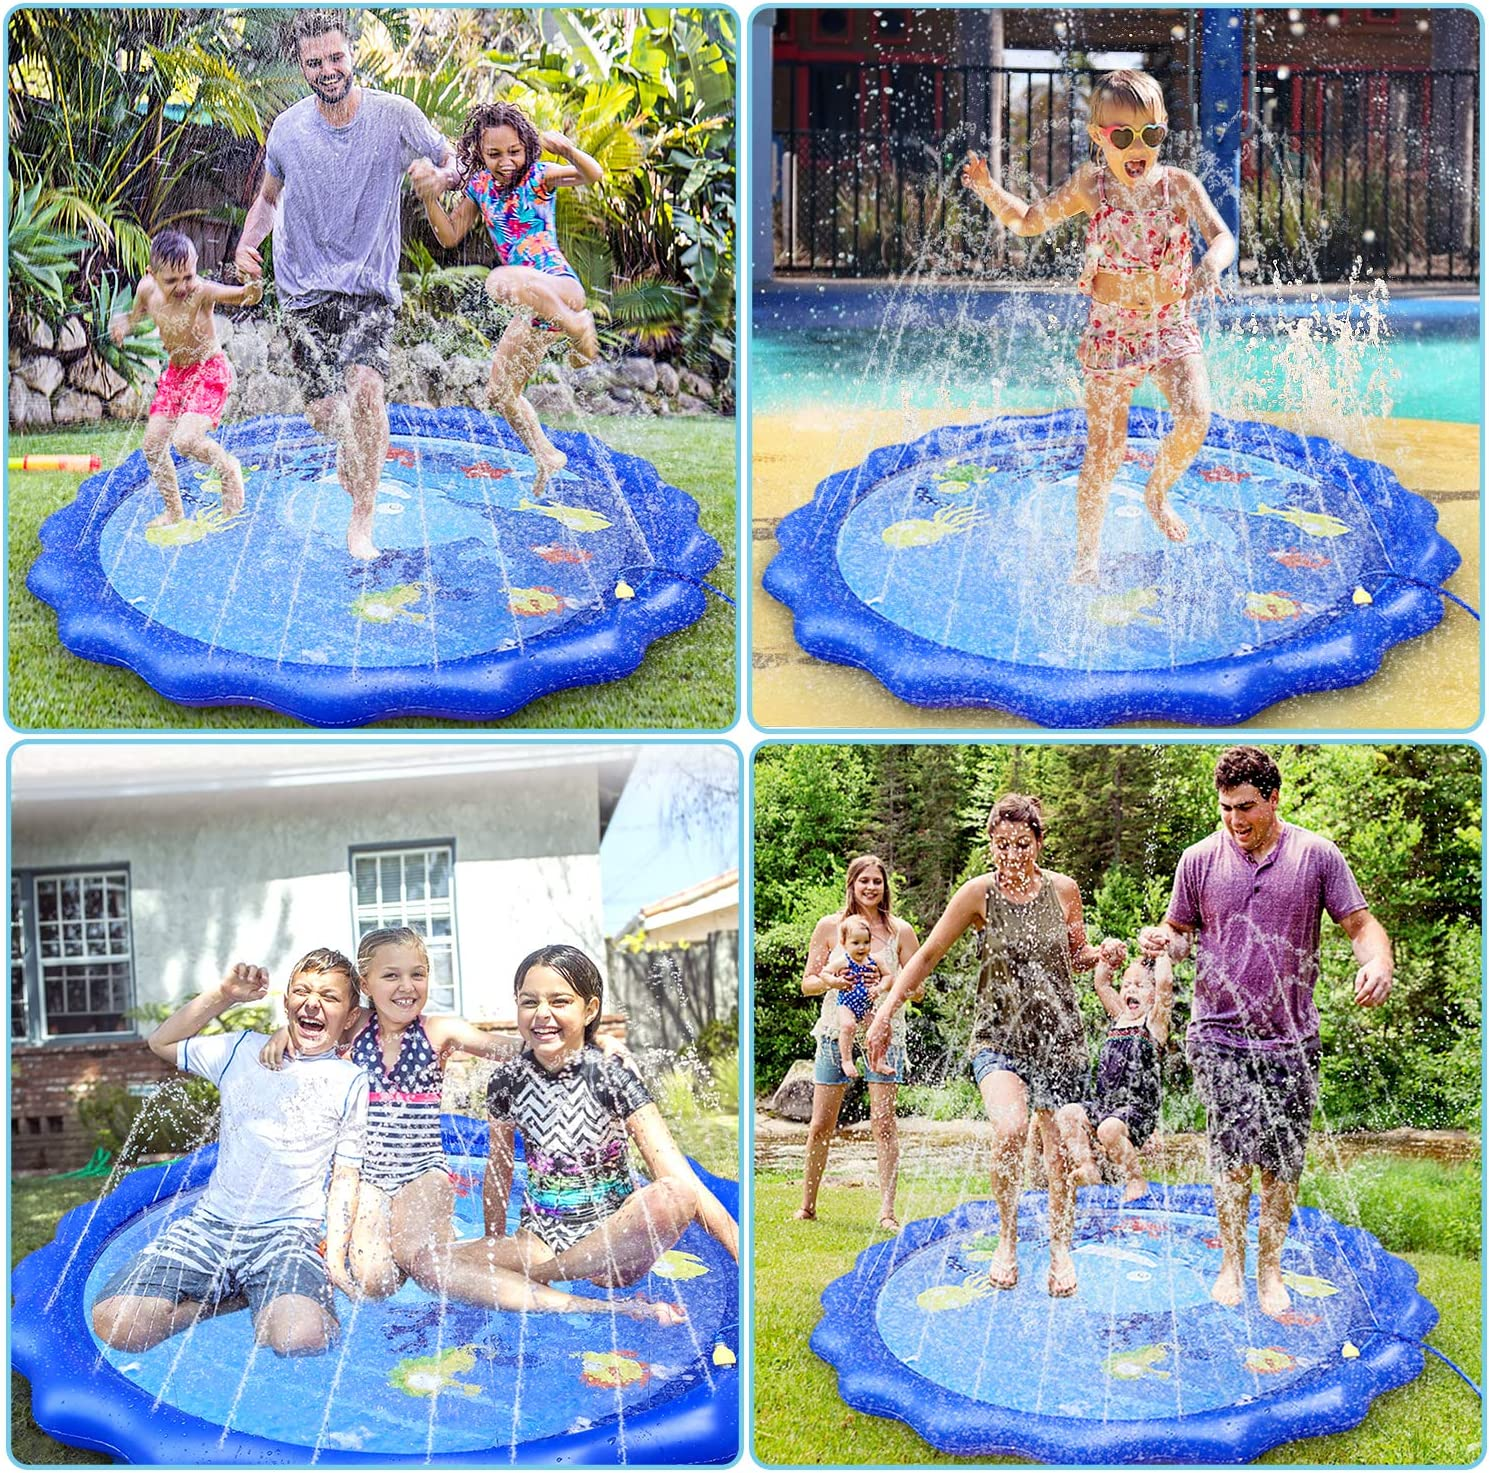 "Giftinthebox Sprinkler &Splash Pad for Kids, 68"" Splash Play Mat Water Toy for Toddlers , Outdoor Water Mat Toys, Baby Infant Wading Swimming Pool Party Outdoor Water Toy for Girls Boys: Toys & Games"